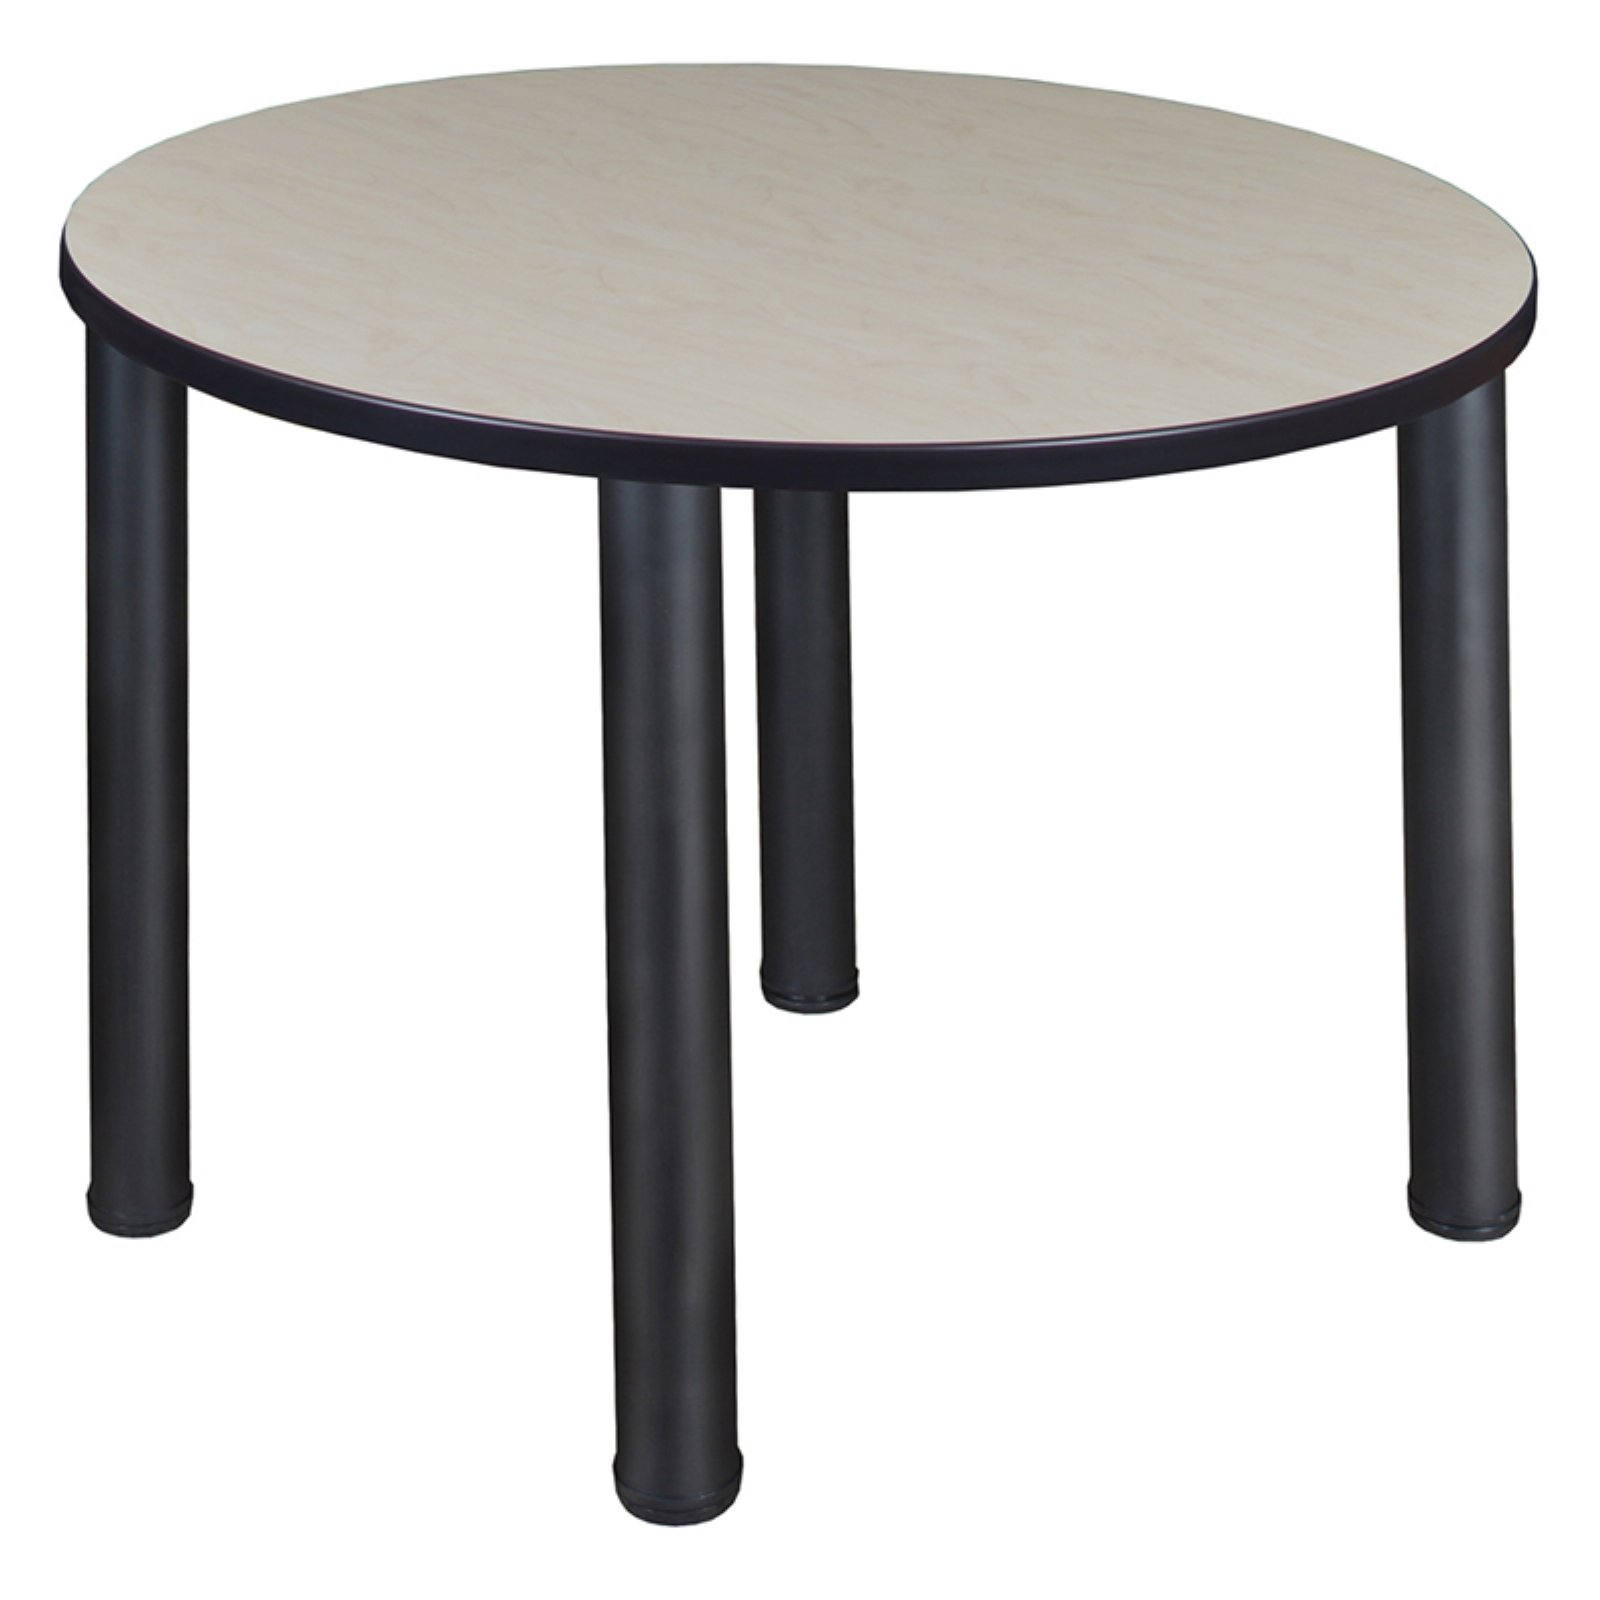 "Kee 48"" Round Breakroom Table- Maple/ Black"